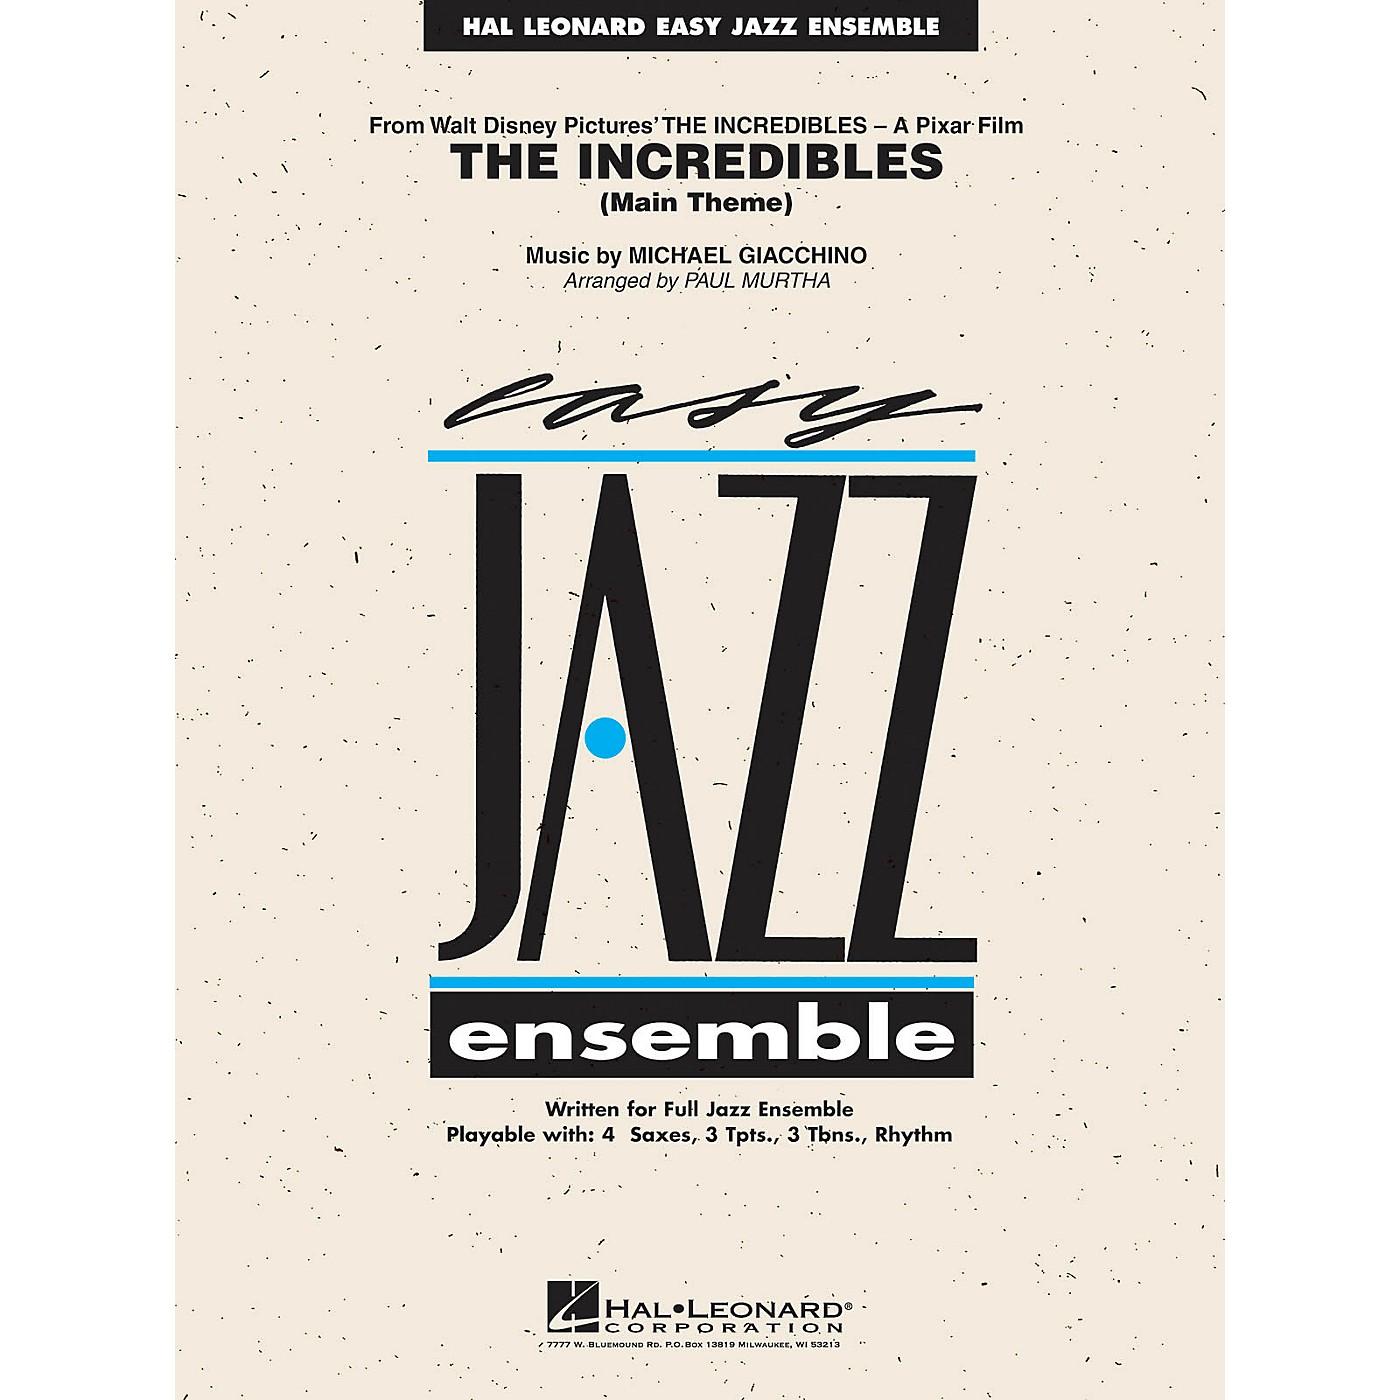 Hal Leonard The Incredibles Jazz Band Level 2 Arranged by Paul Murtha thumbnail